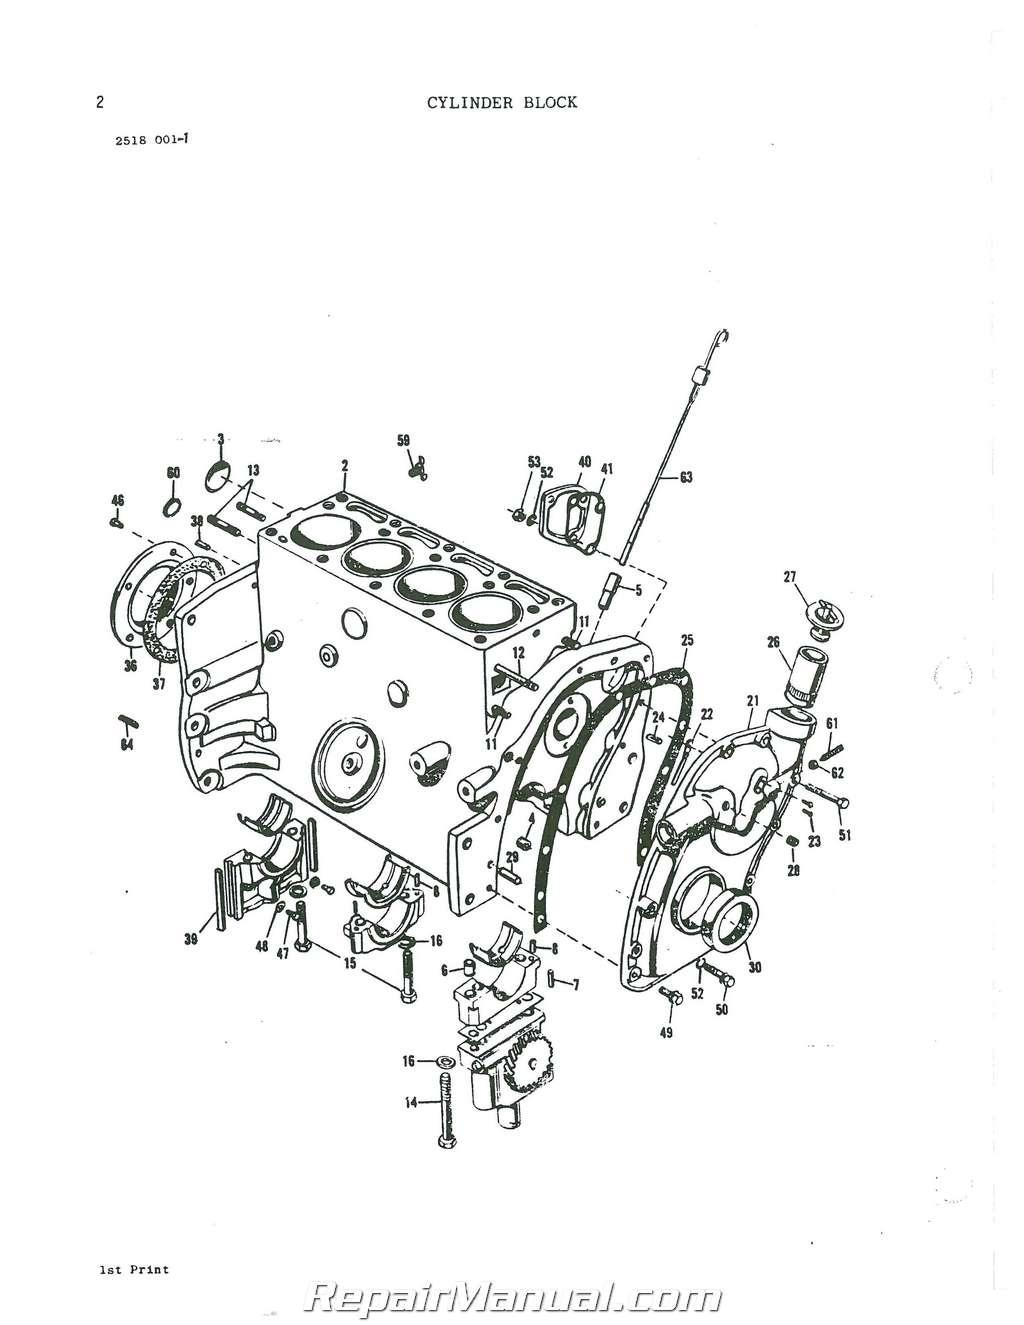 Massey Ferguson Repair Parts : Massey ferguson parts manual